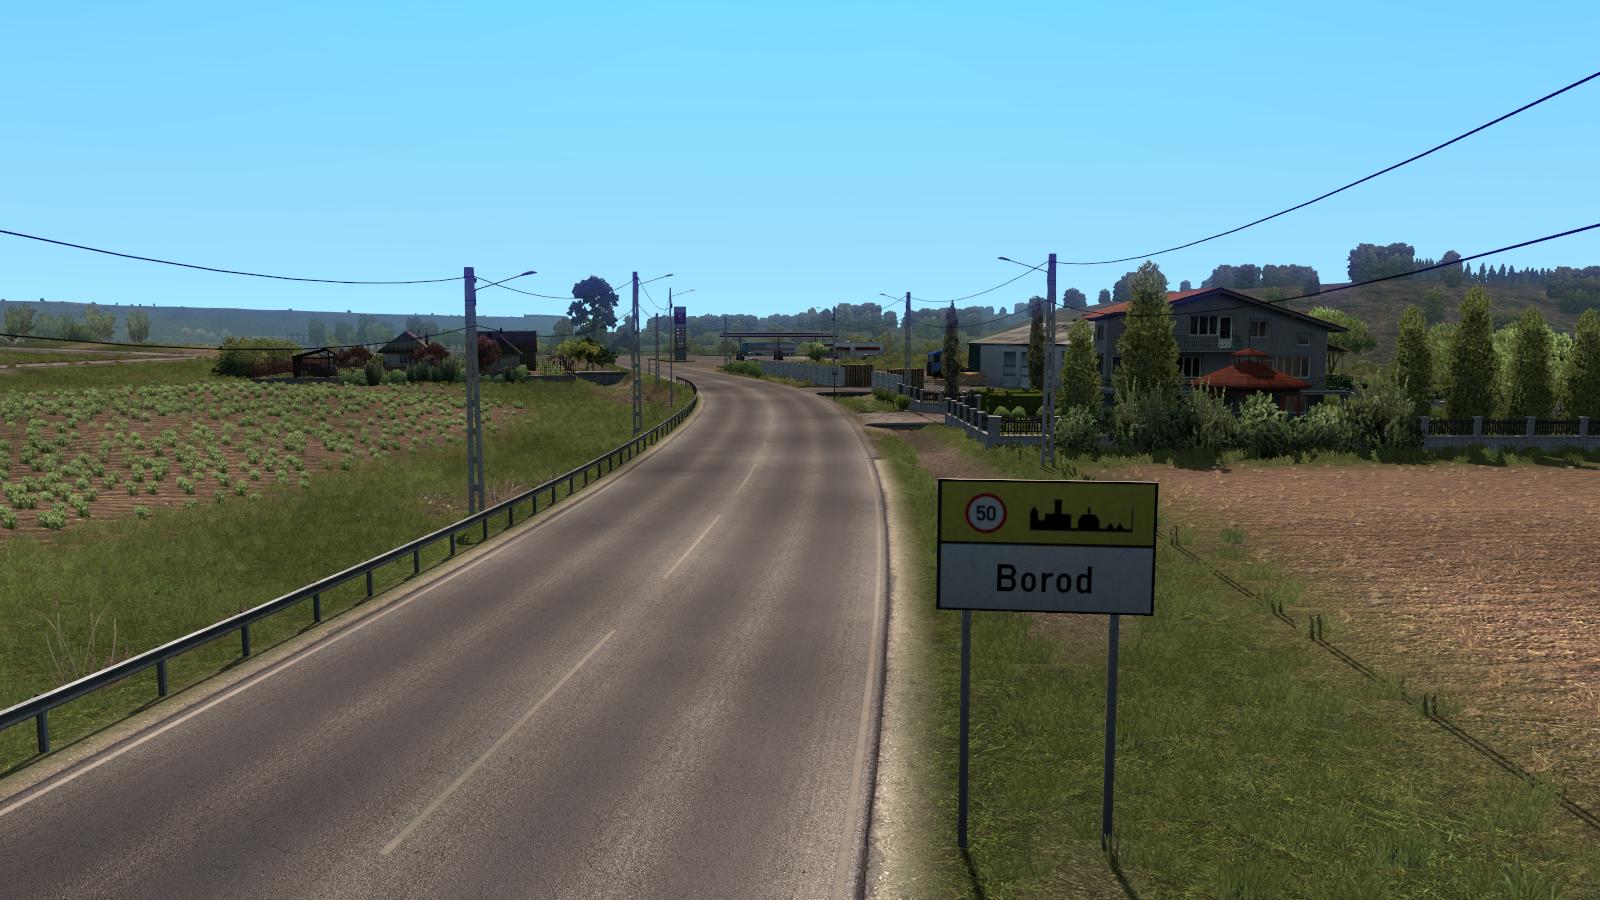 Borod